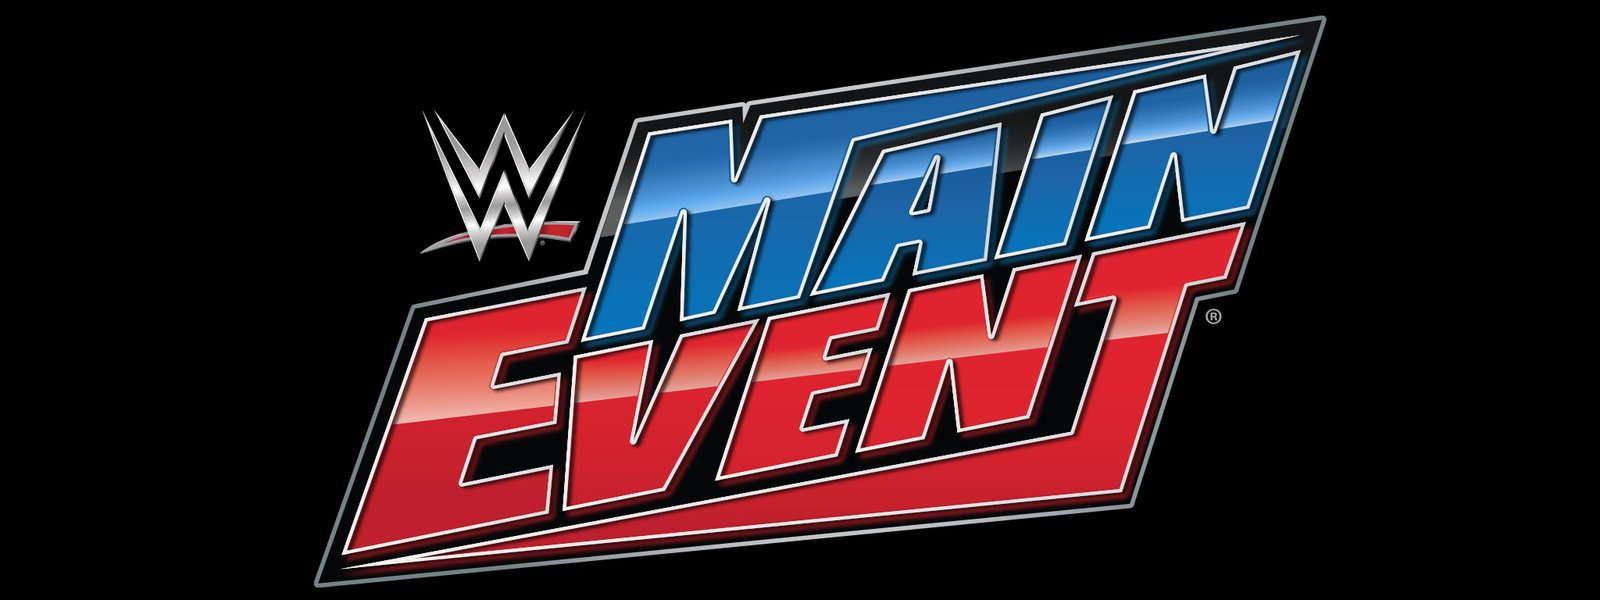 WWE Main Event 2018 05 18 HDTV x264-Ebi